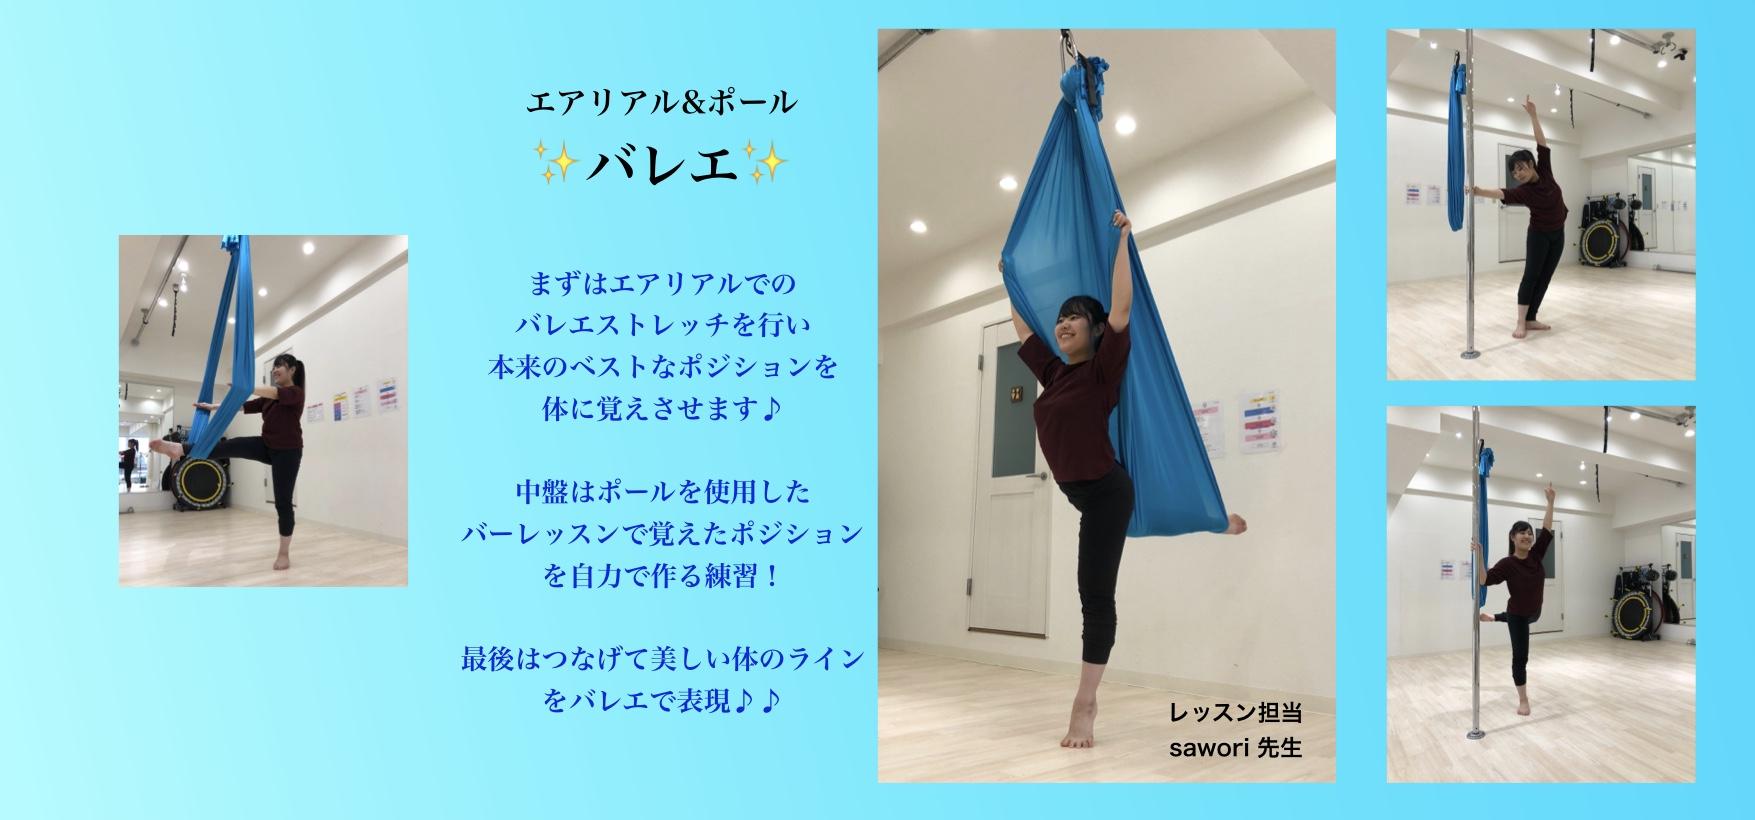 aerial-pole-ballet